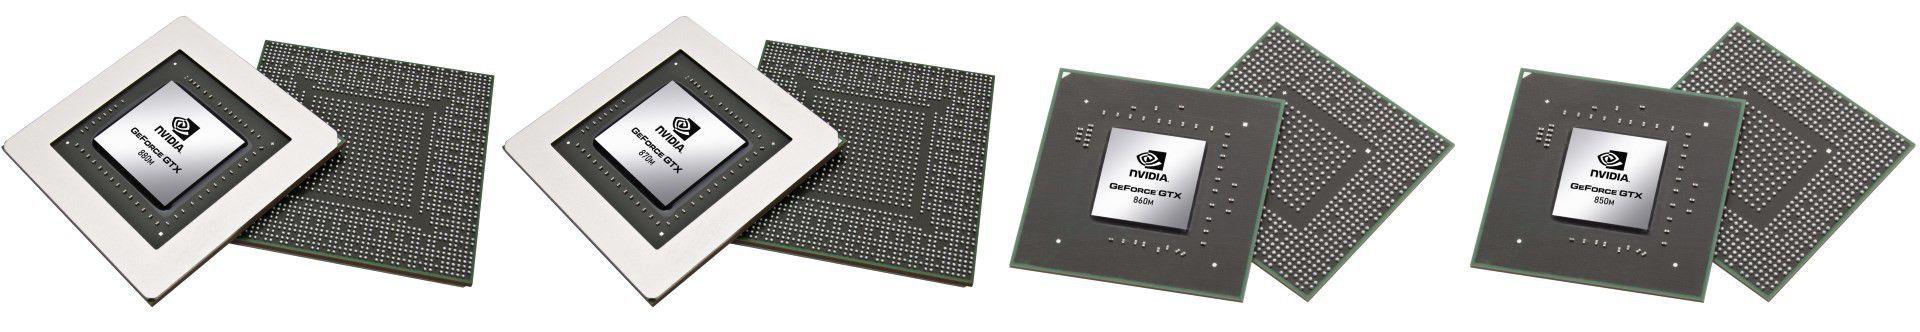 Nvidia notebook gtx 800m